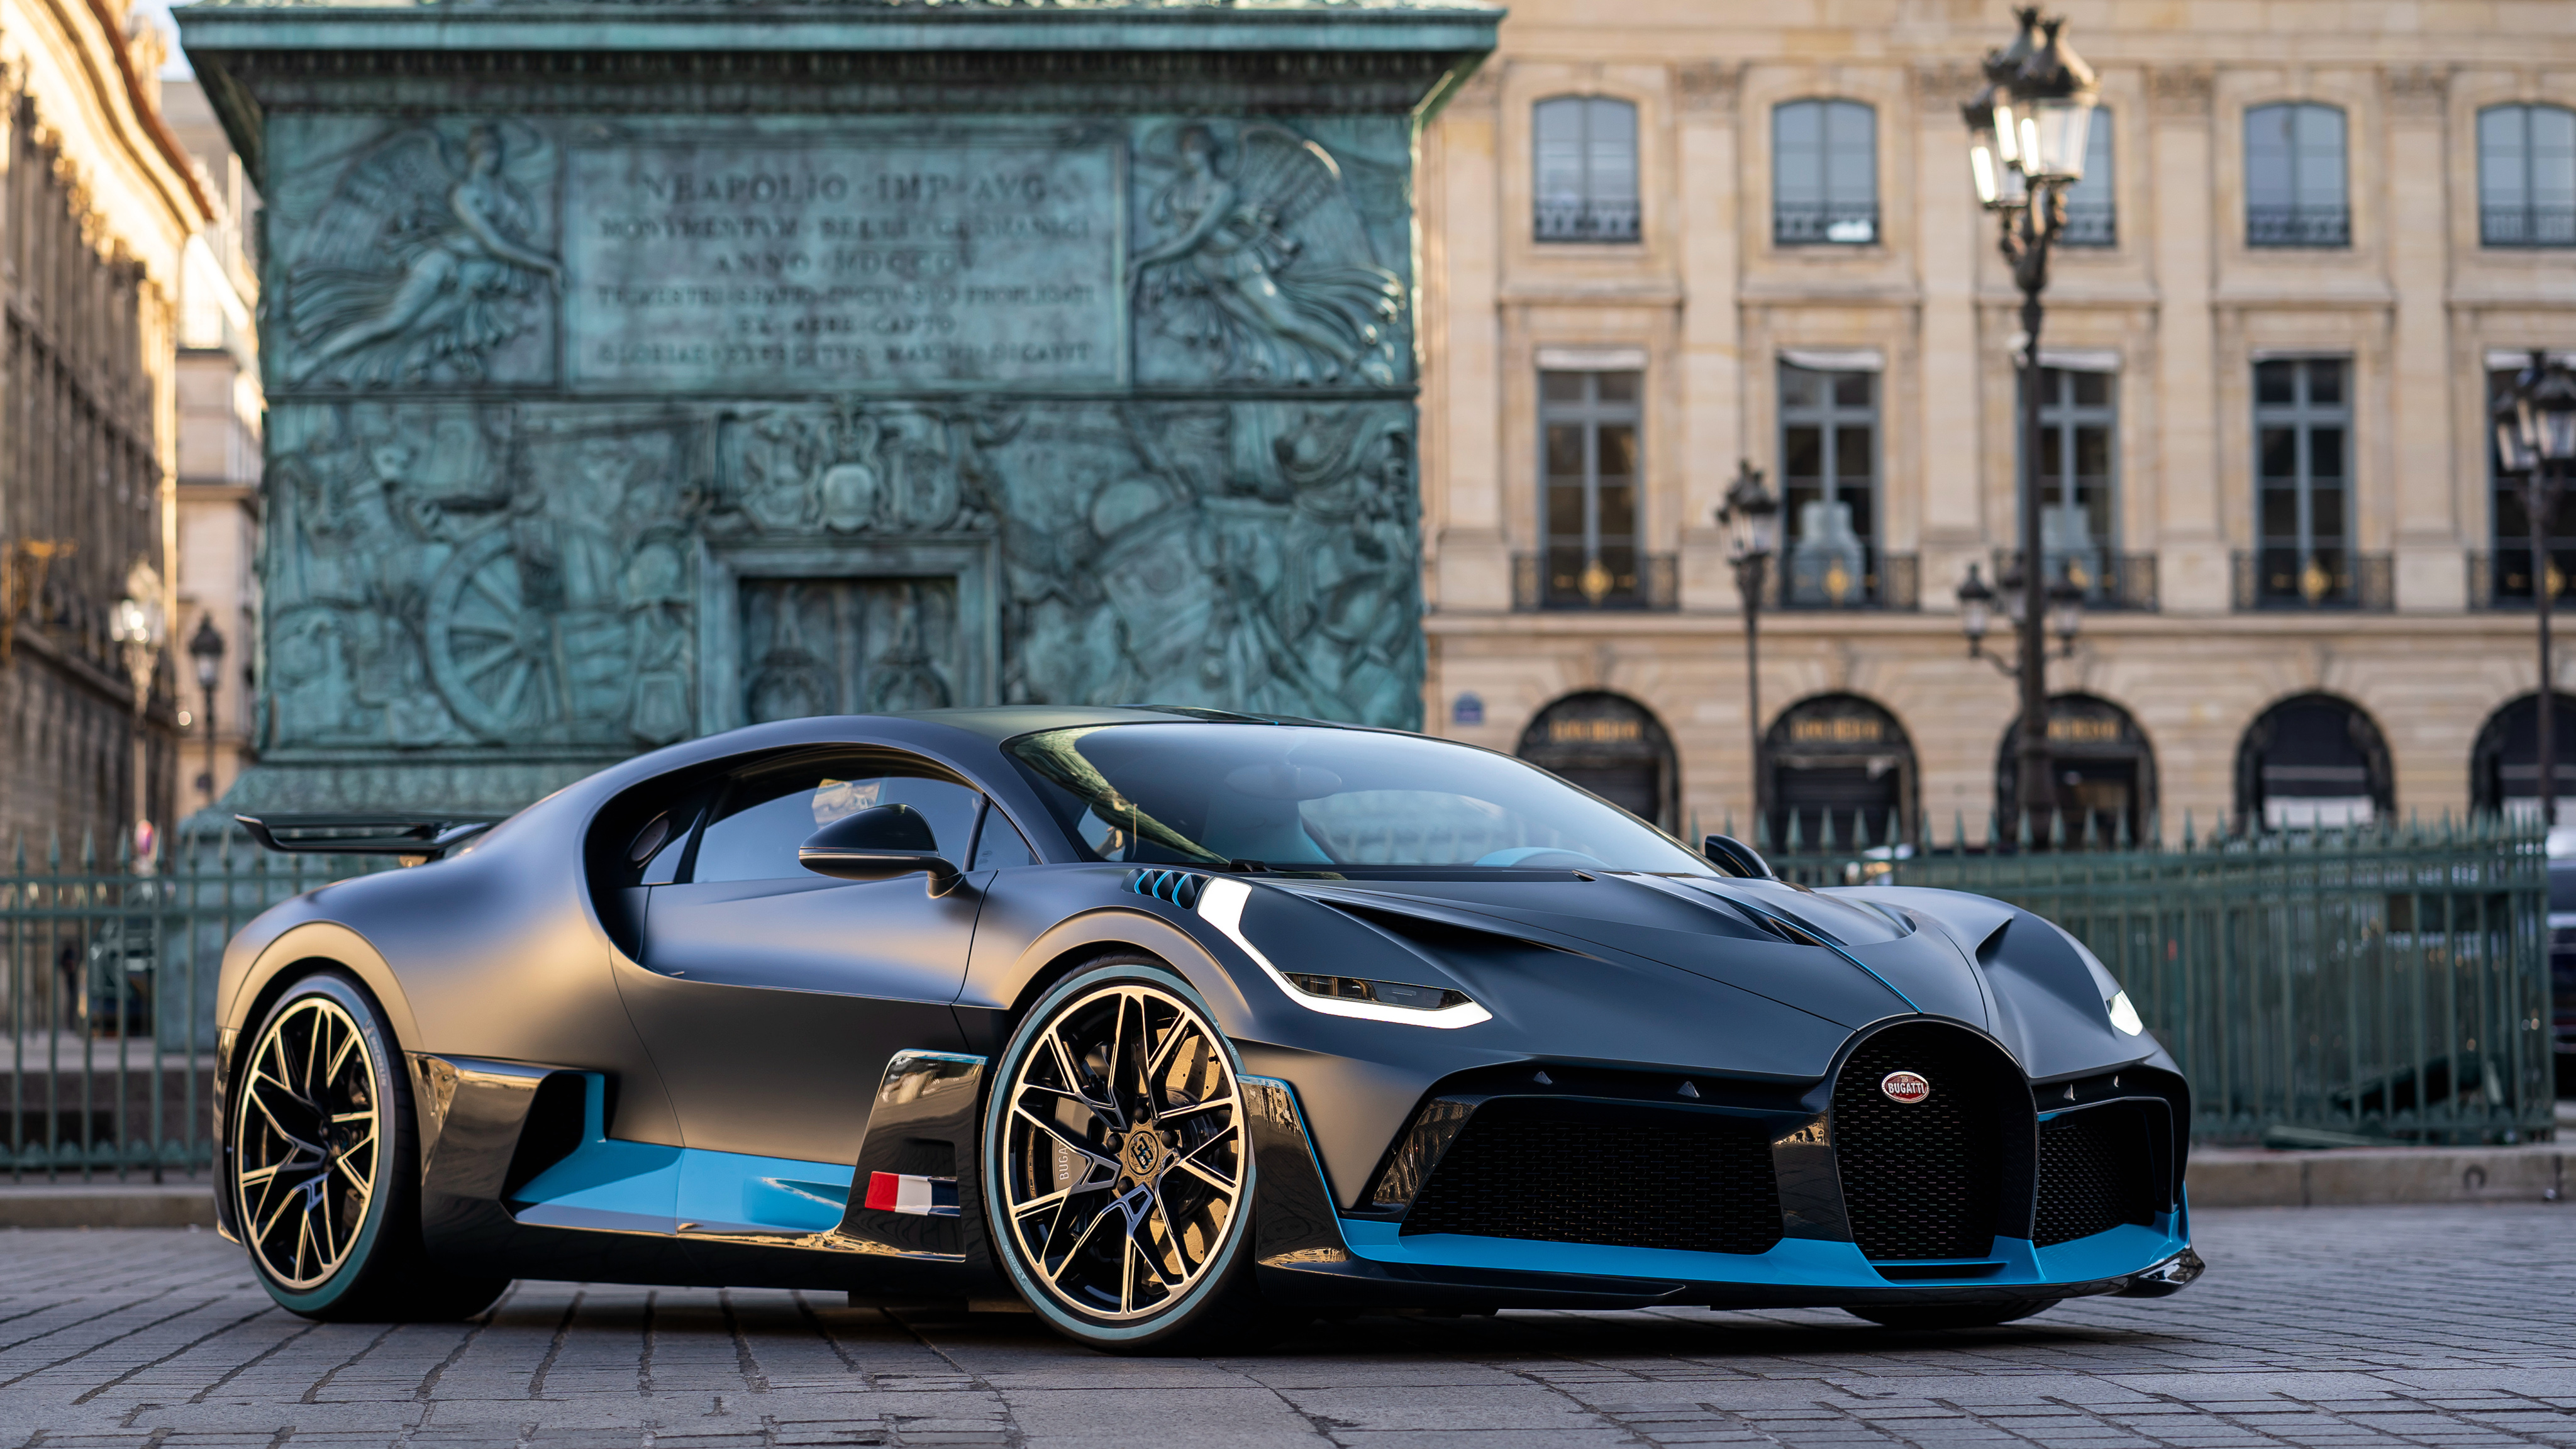 Bugatti Divo in Paris 4K Wallpaper | HD Car Wallpapers | ID #11339